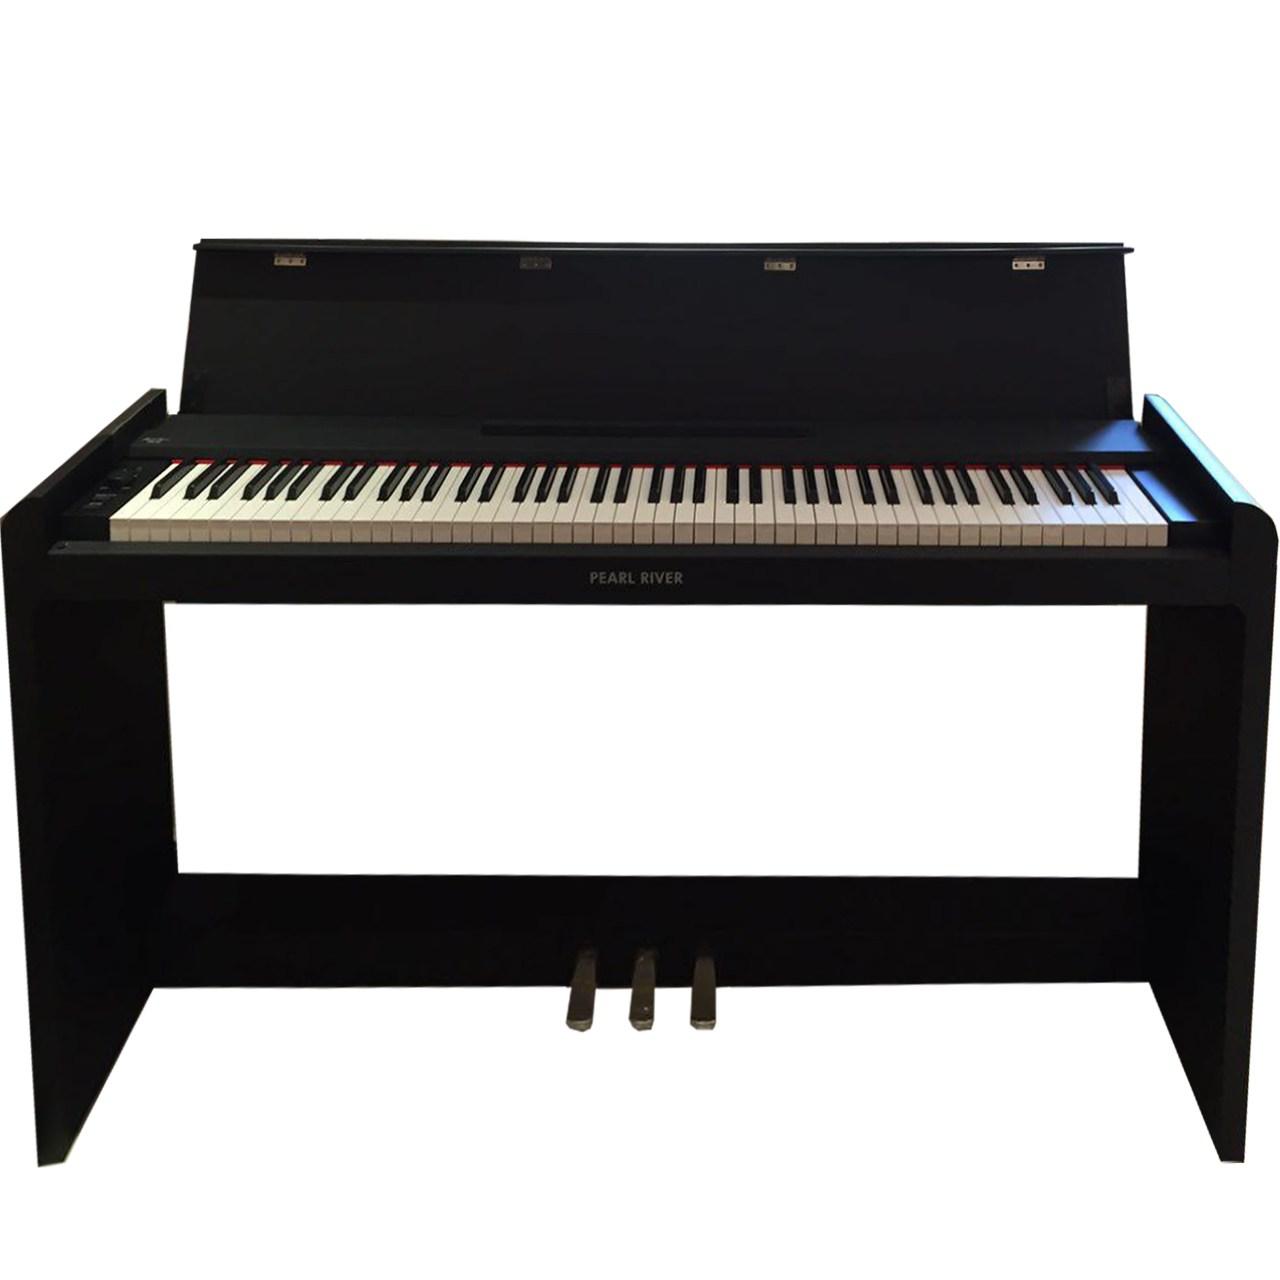 پیانو دیجیتال پرل ریور مدل PRK 80